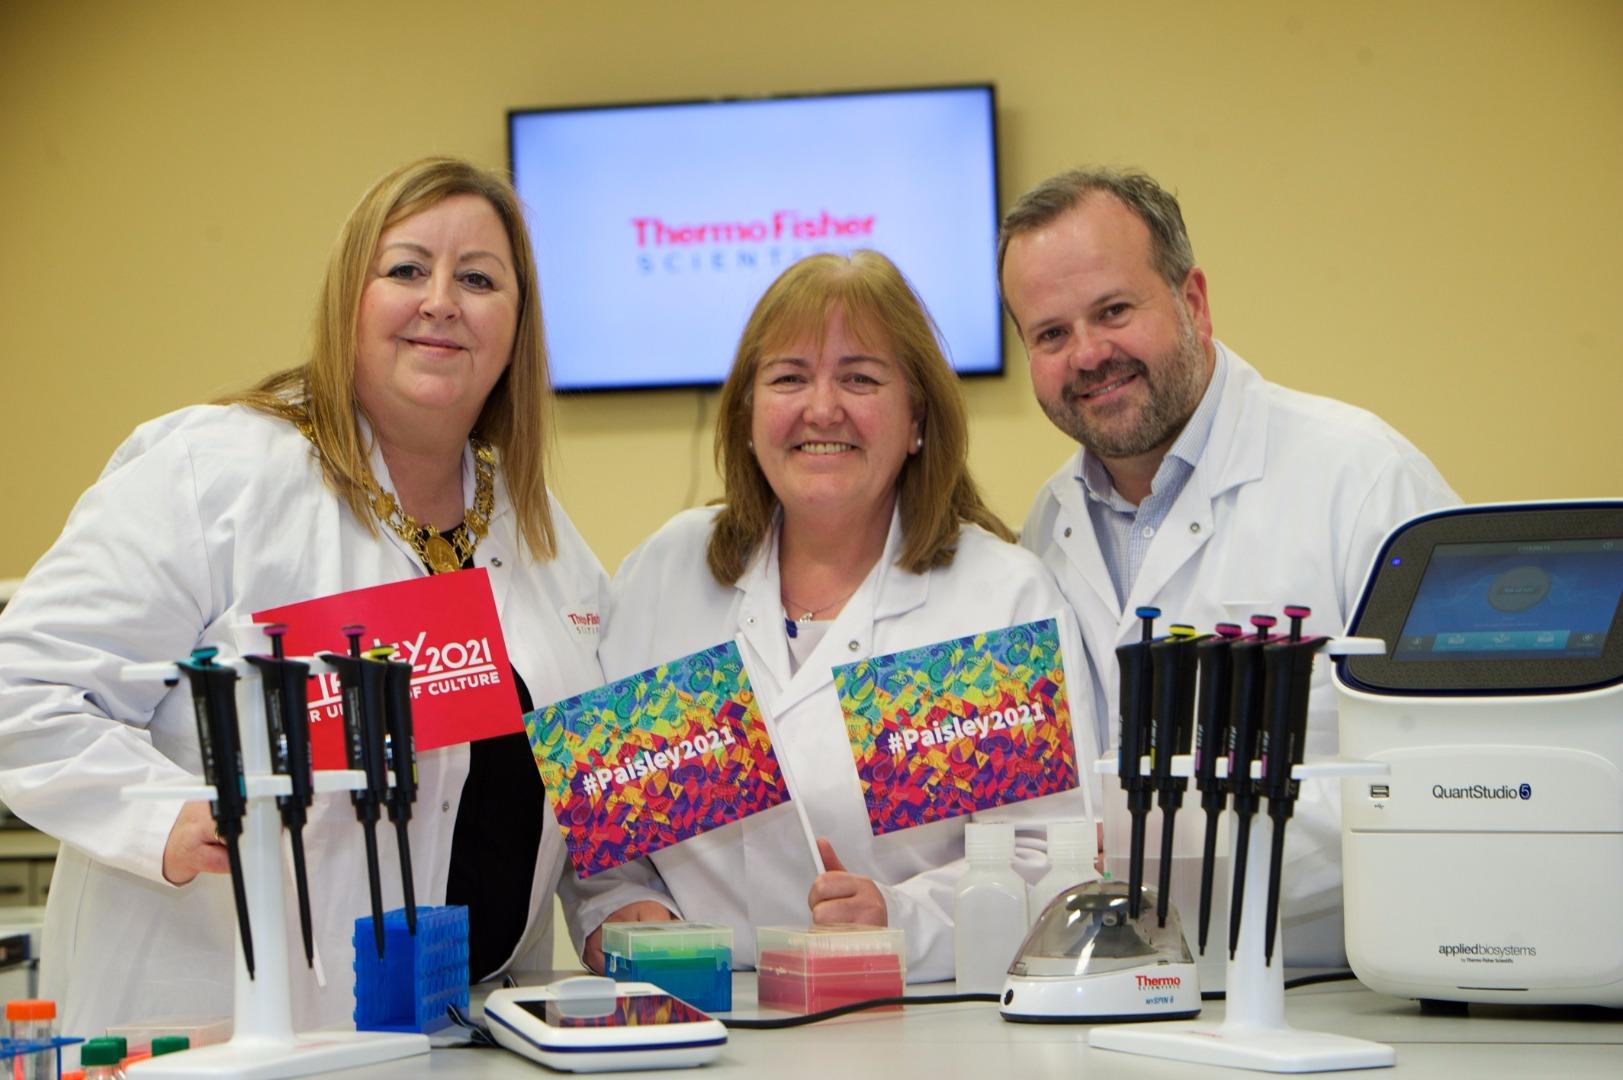 International Life Sciences firm backs Paisley's UK City of Culture 2021 bid